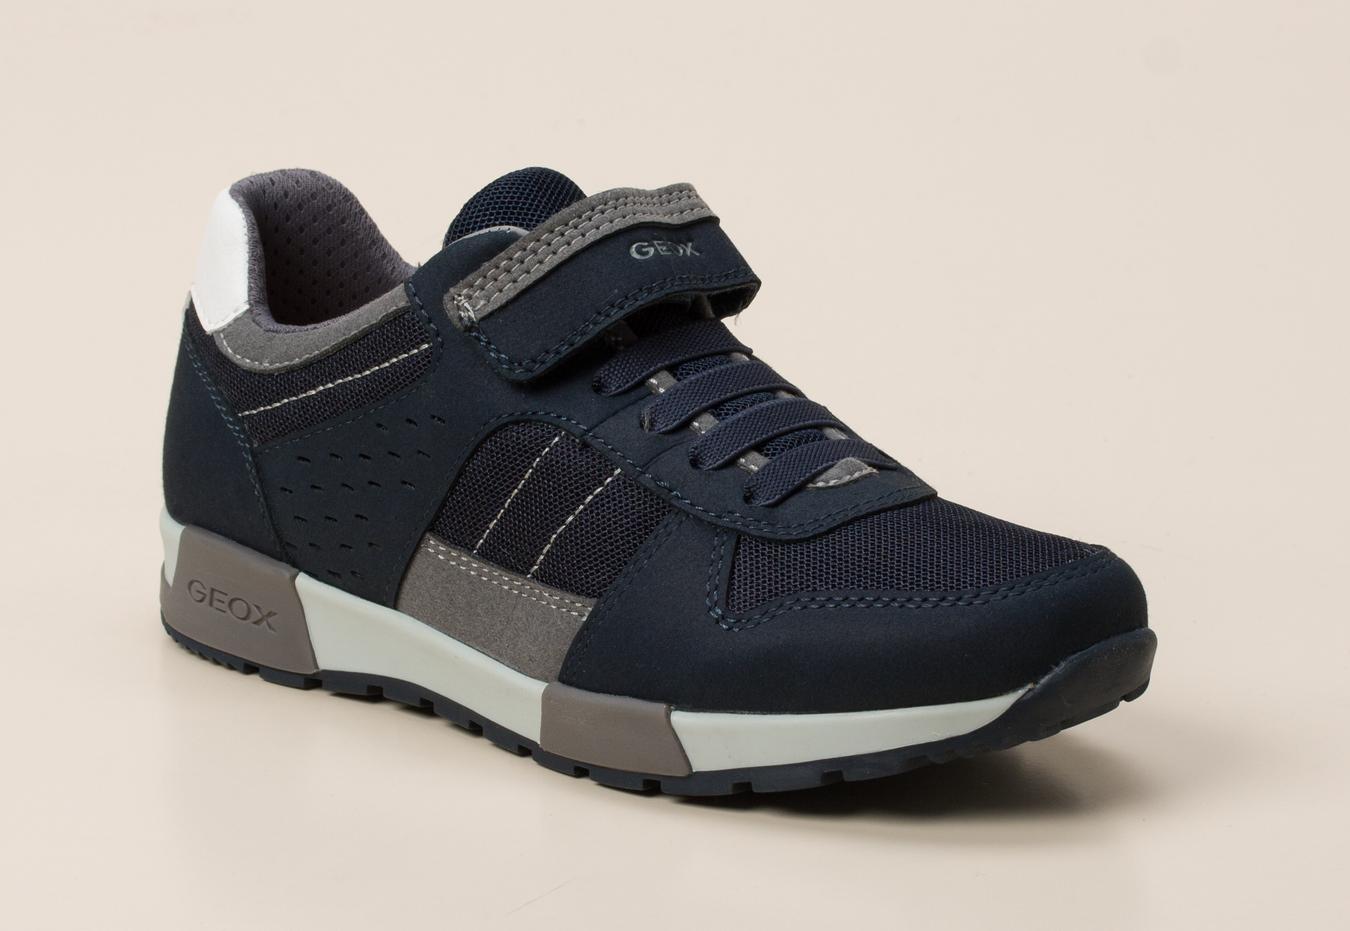 details for exquisite design best shoes Geox Kinder Sneaker in dunkelblau kaufen | Zumnorde Online-Shop